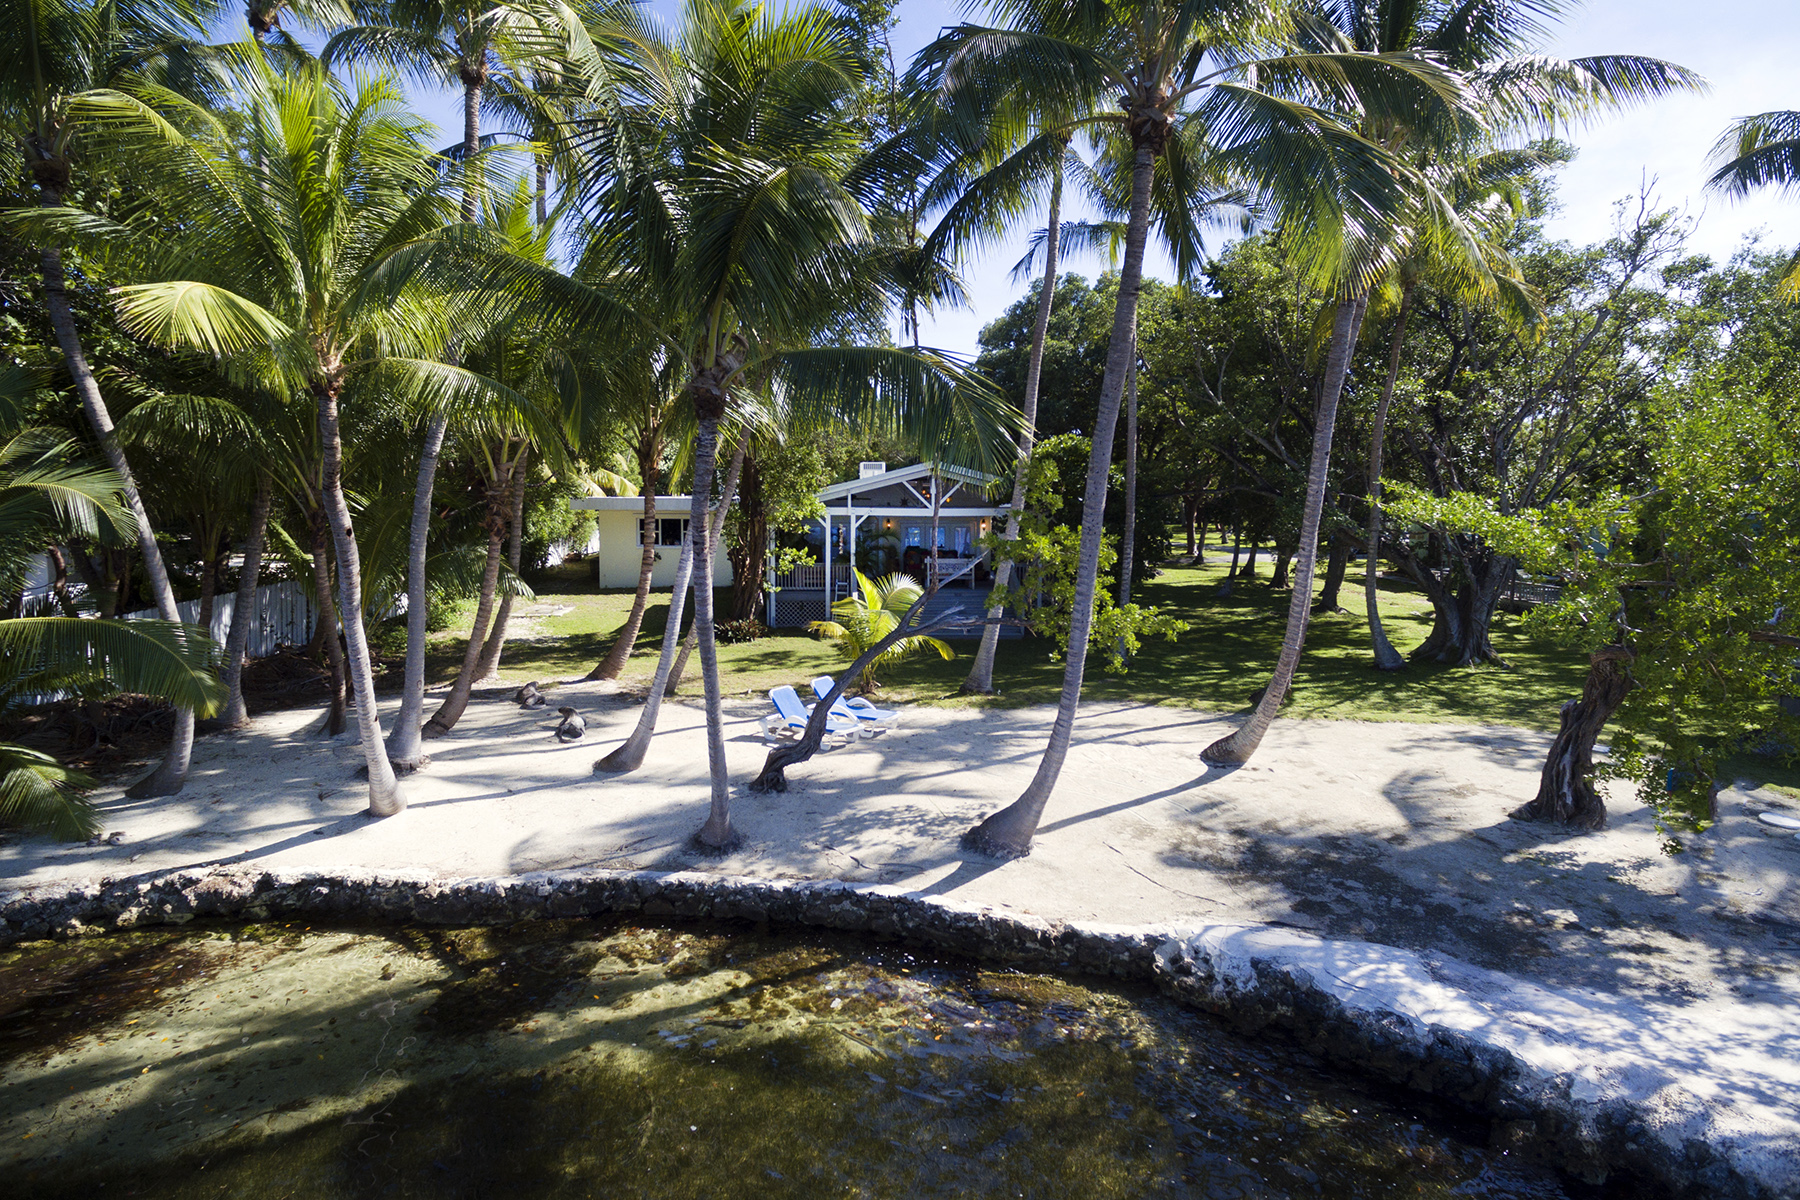 Single Family Home for Sale at Premier Location 82230 Overseas Highway Islamorada, Florida, 33036 United States